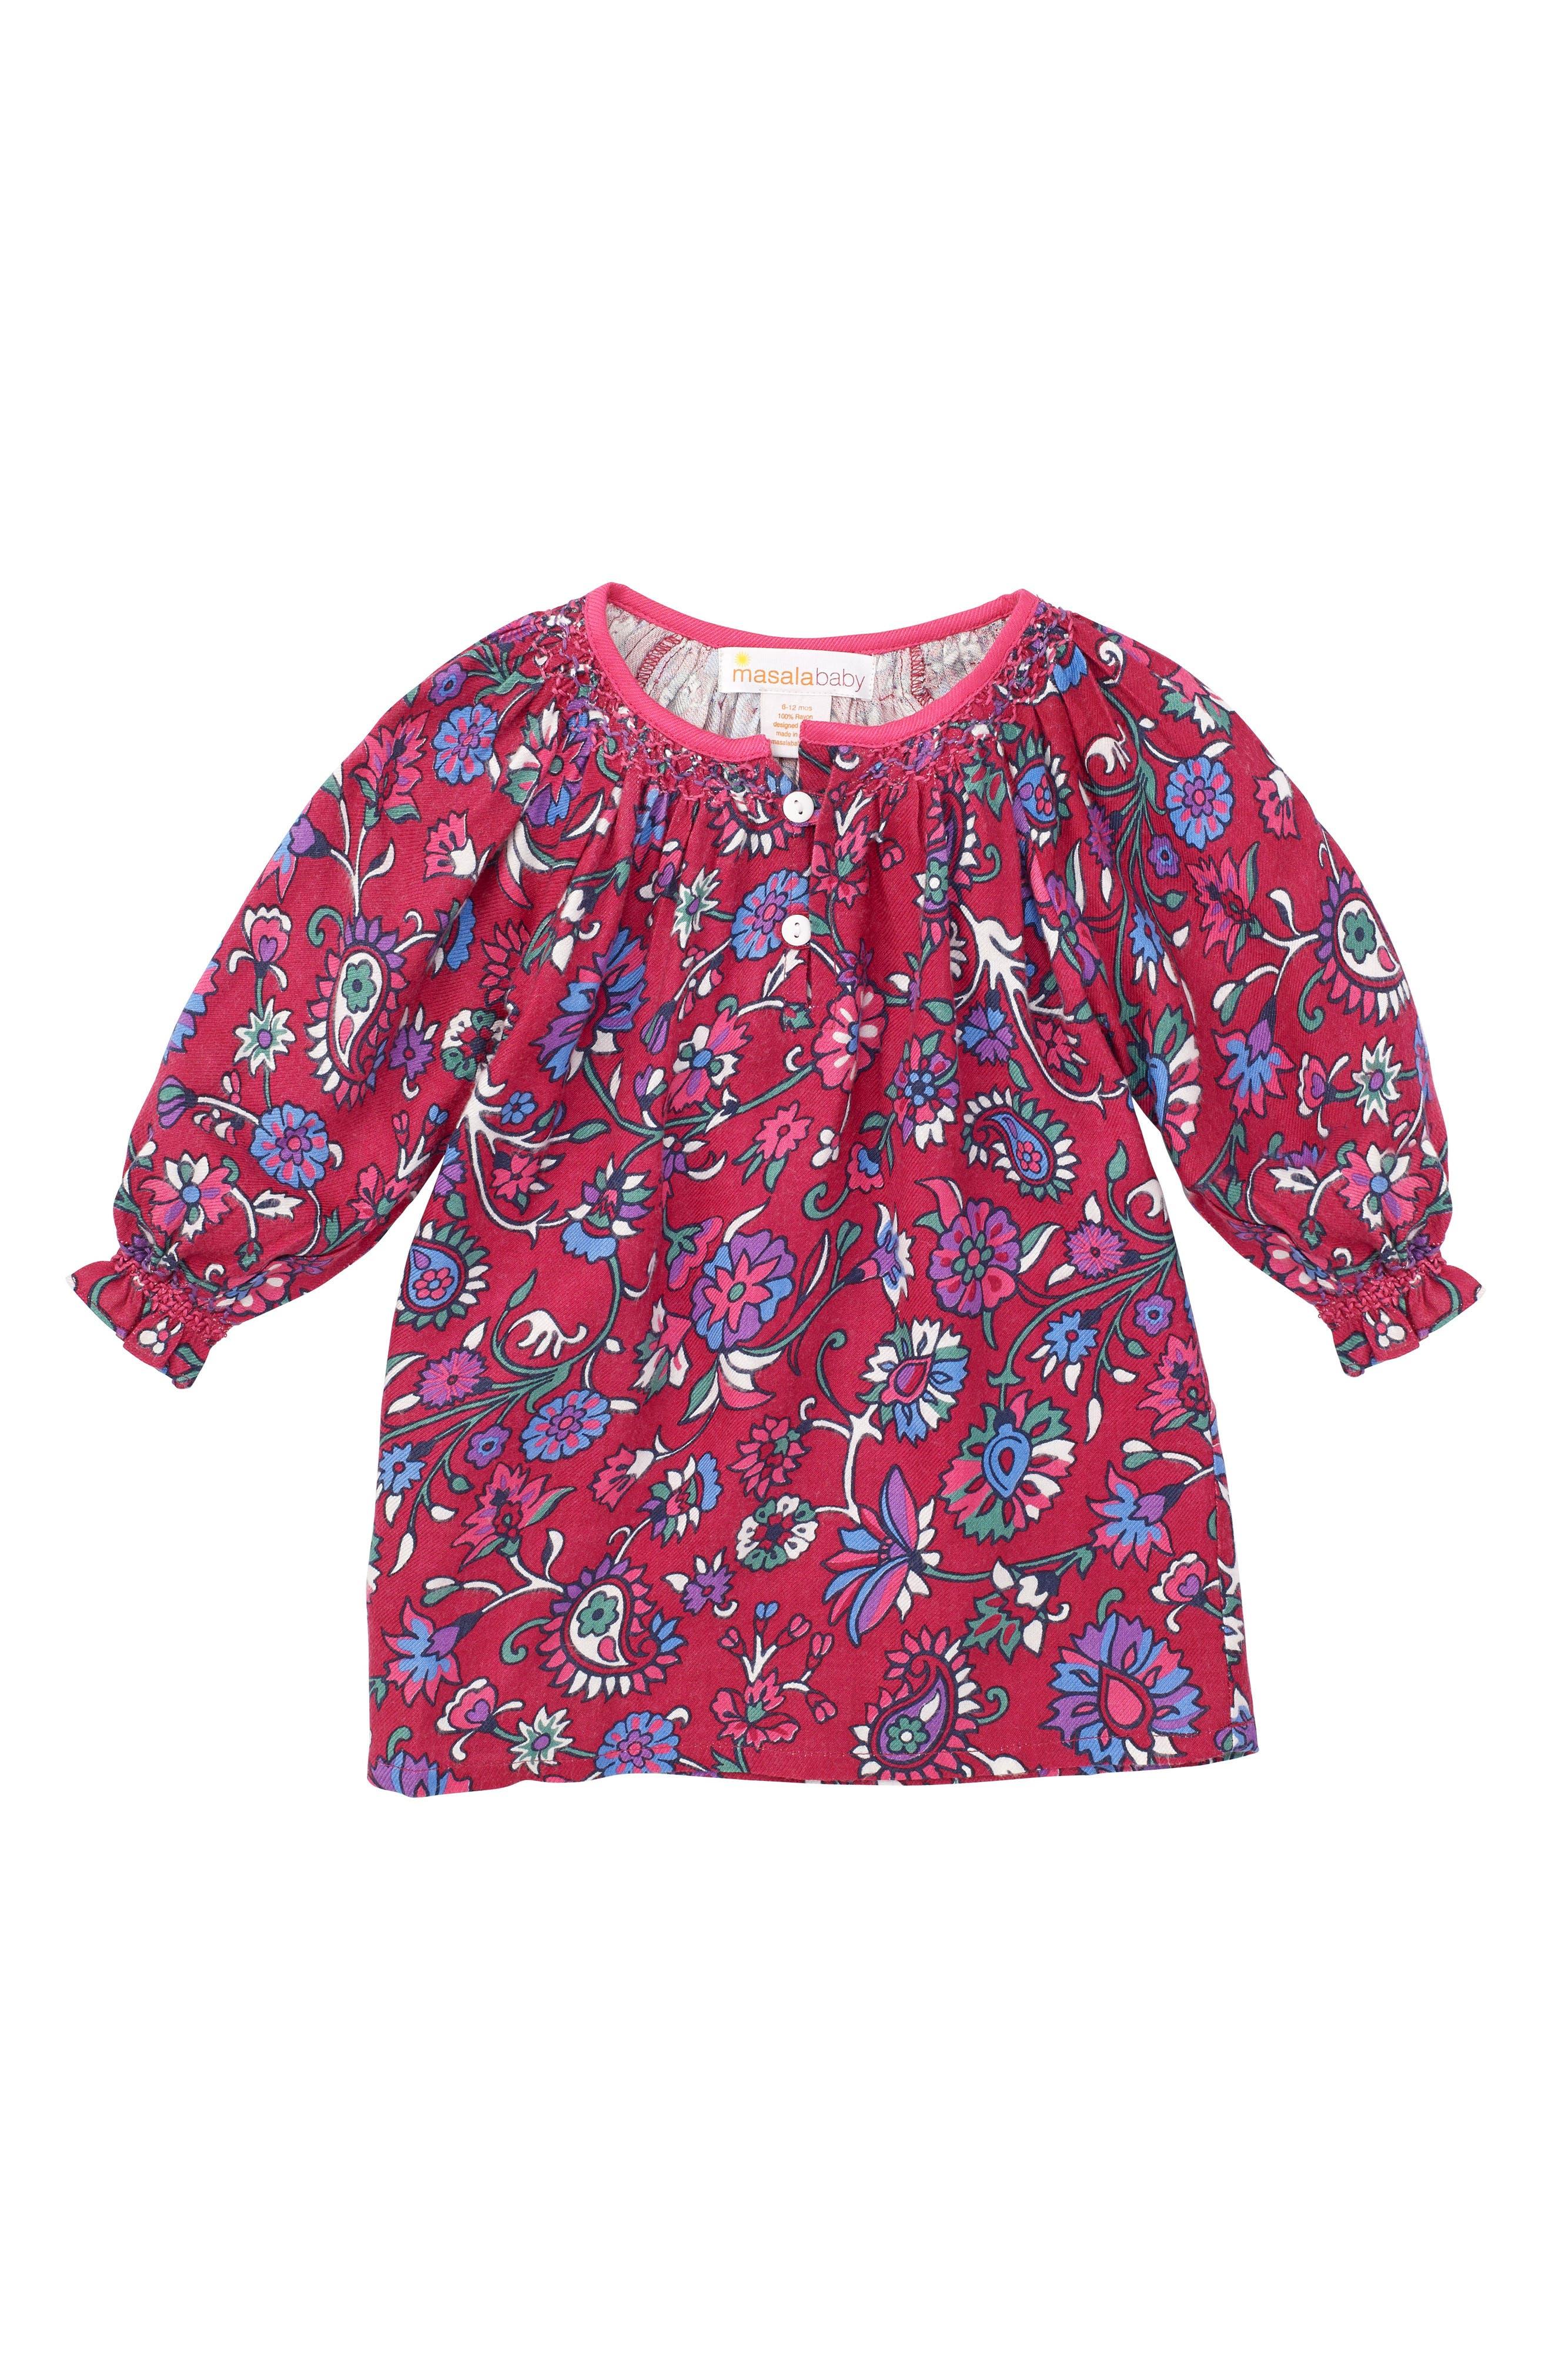 Masalababy Ada Floral Dress (Baby Girls)